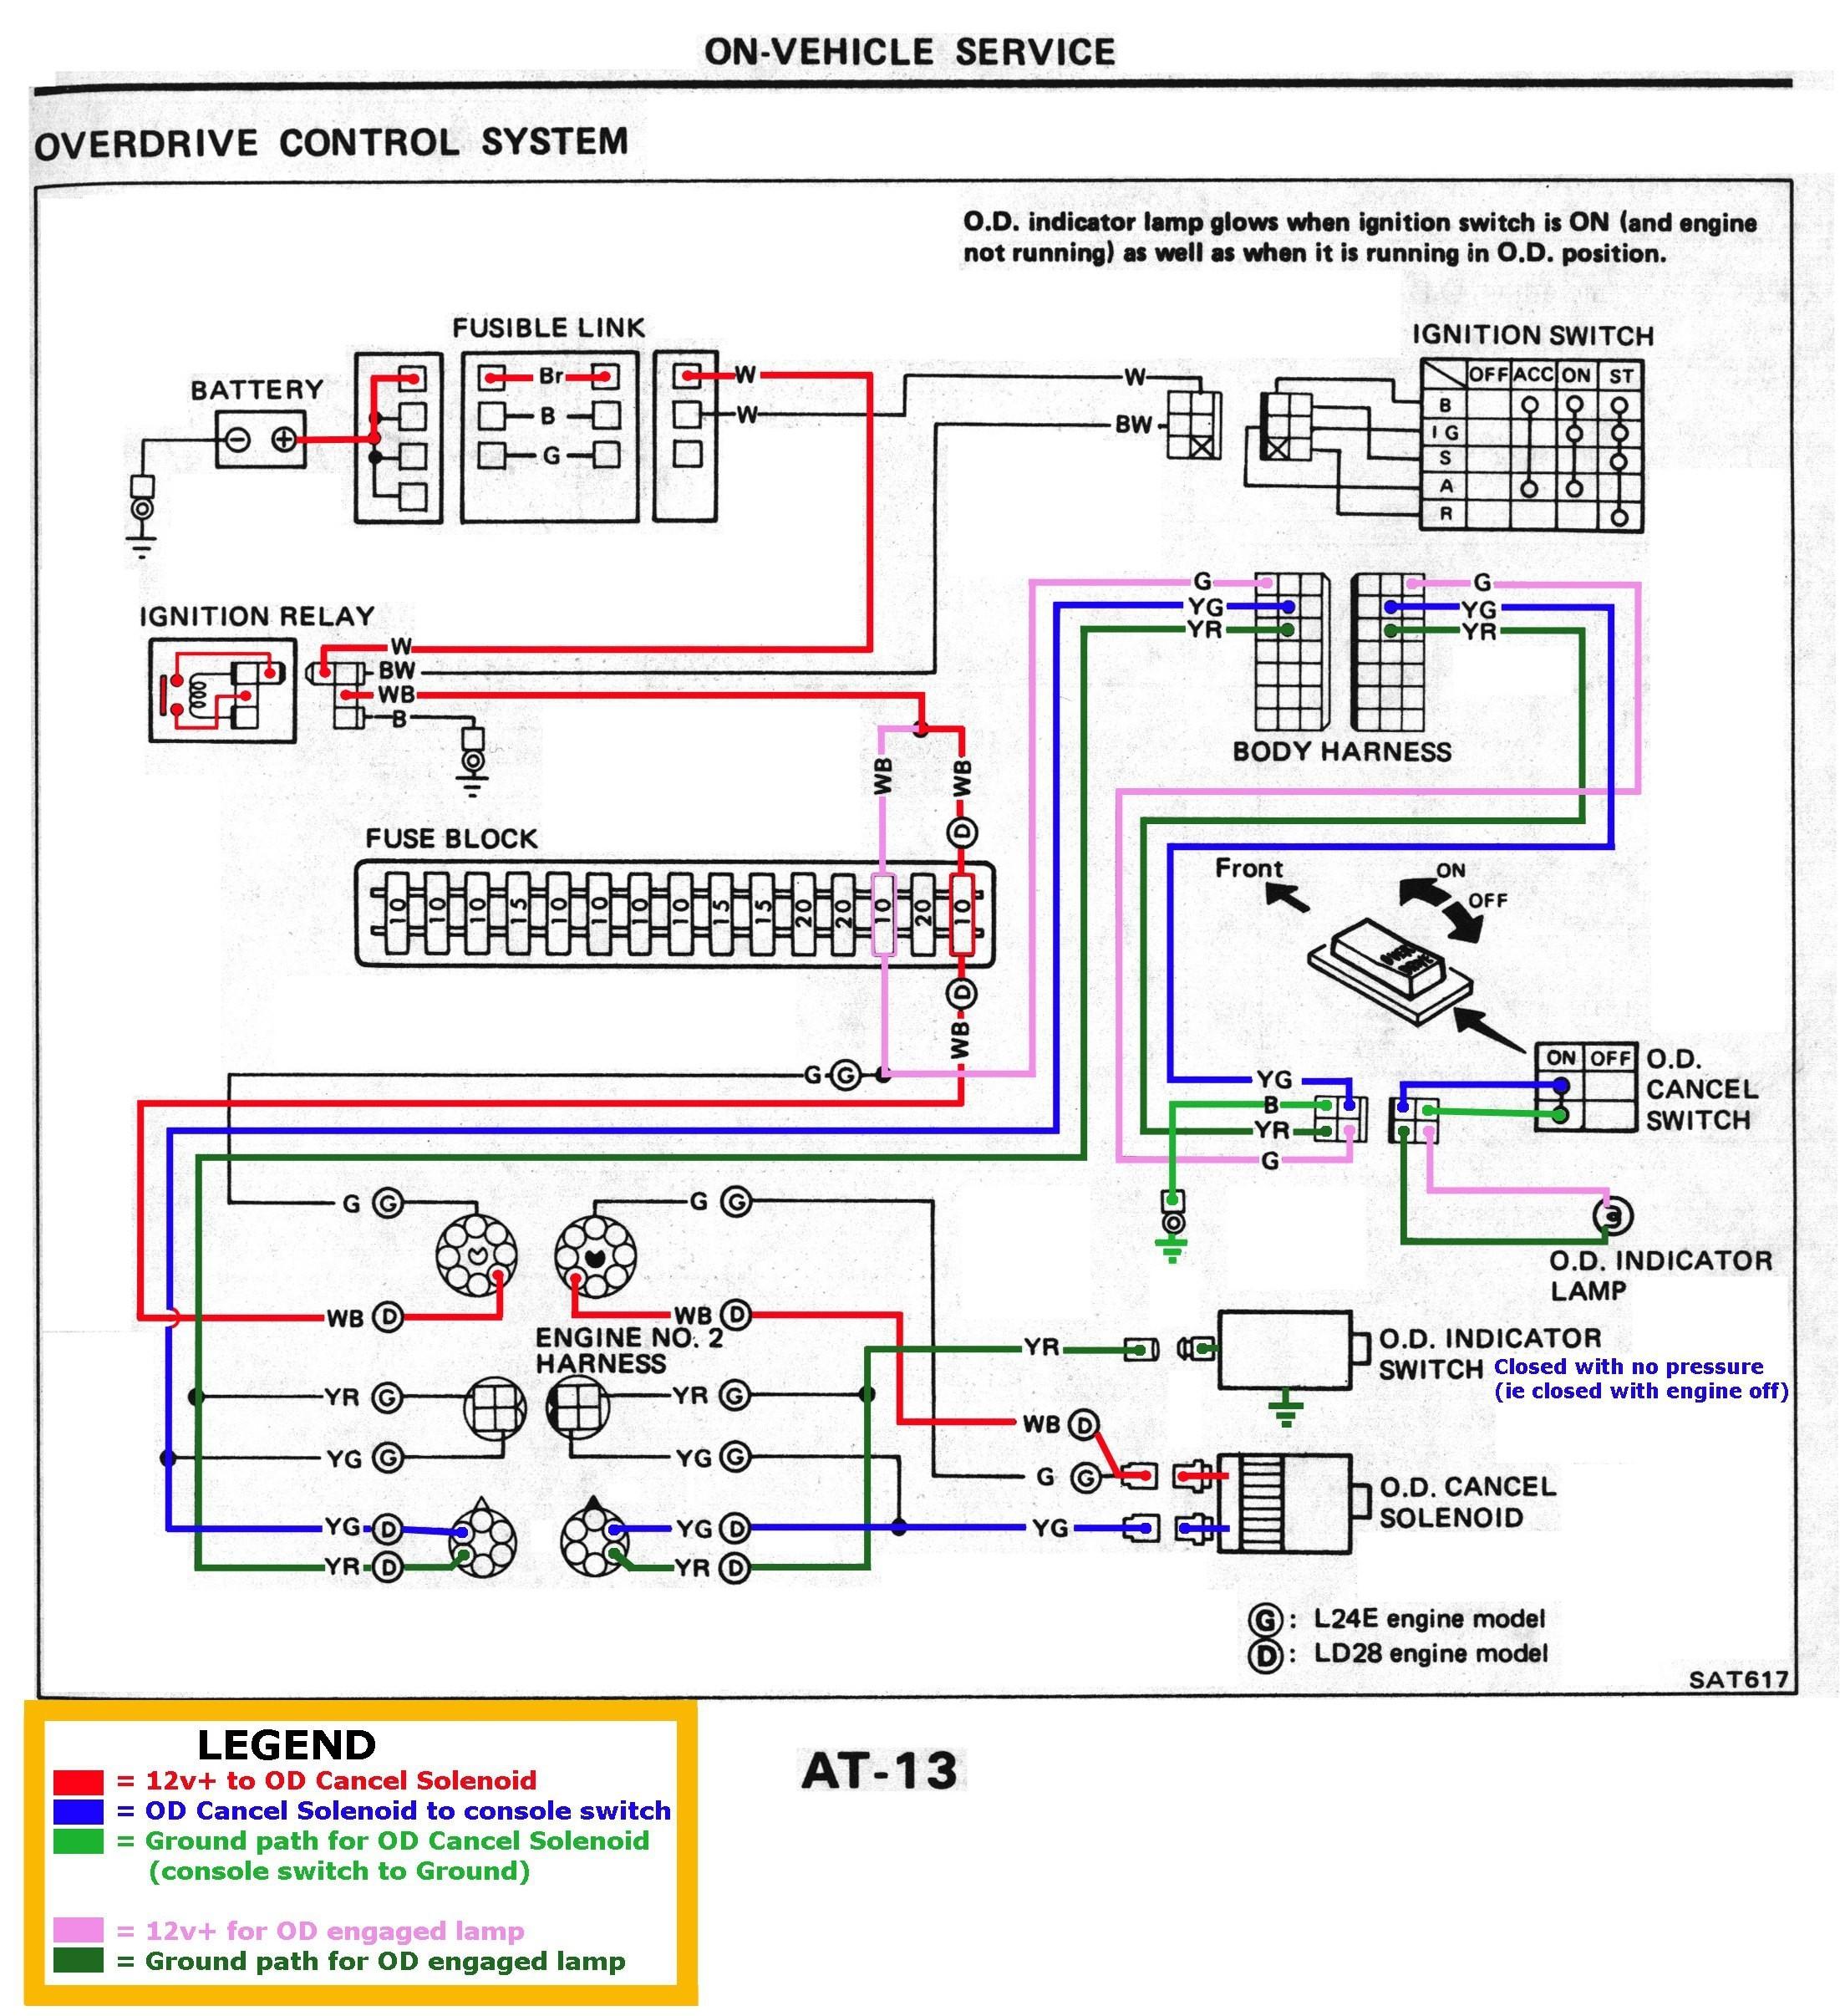 3 Prong Flasher Wiring Diagram Ns 8603] Nissan Micra K11 Indicator Wiring Diagram Of 3 Prong Flasher Wiring Diagram